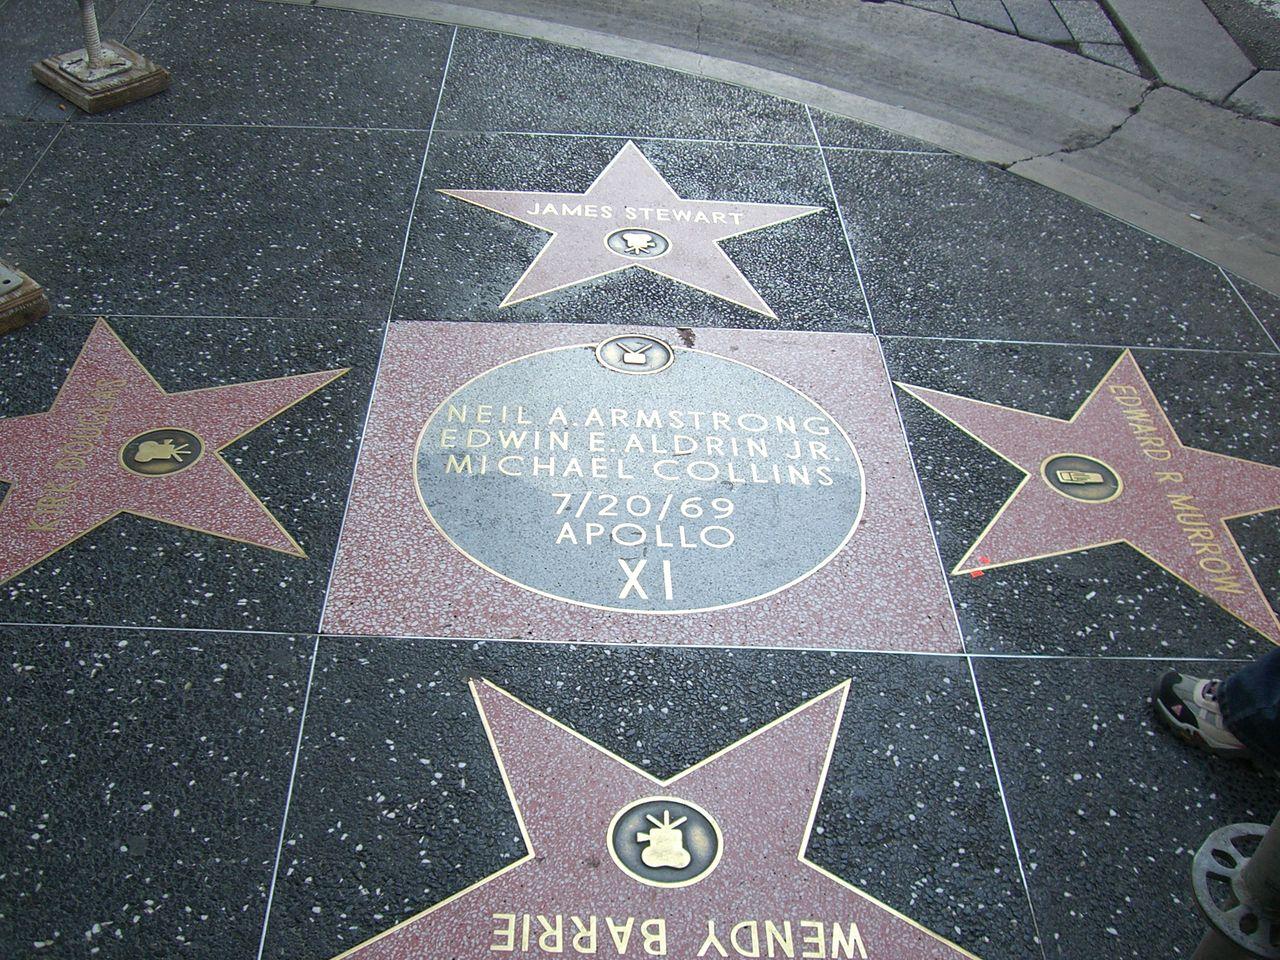 Аллея славы Голливуда, знак Миссия Аполлона 11